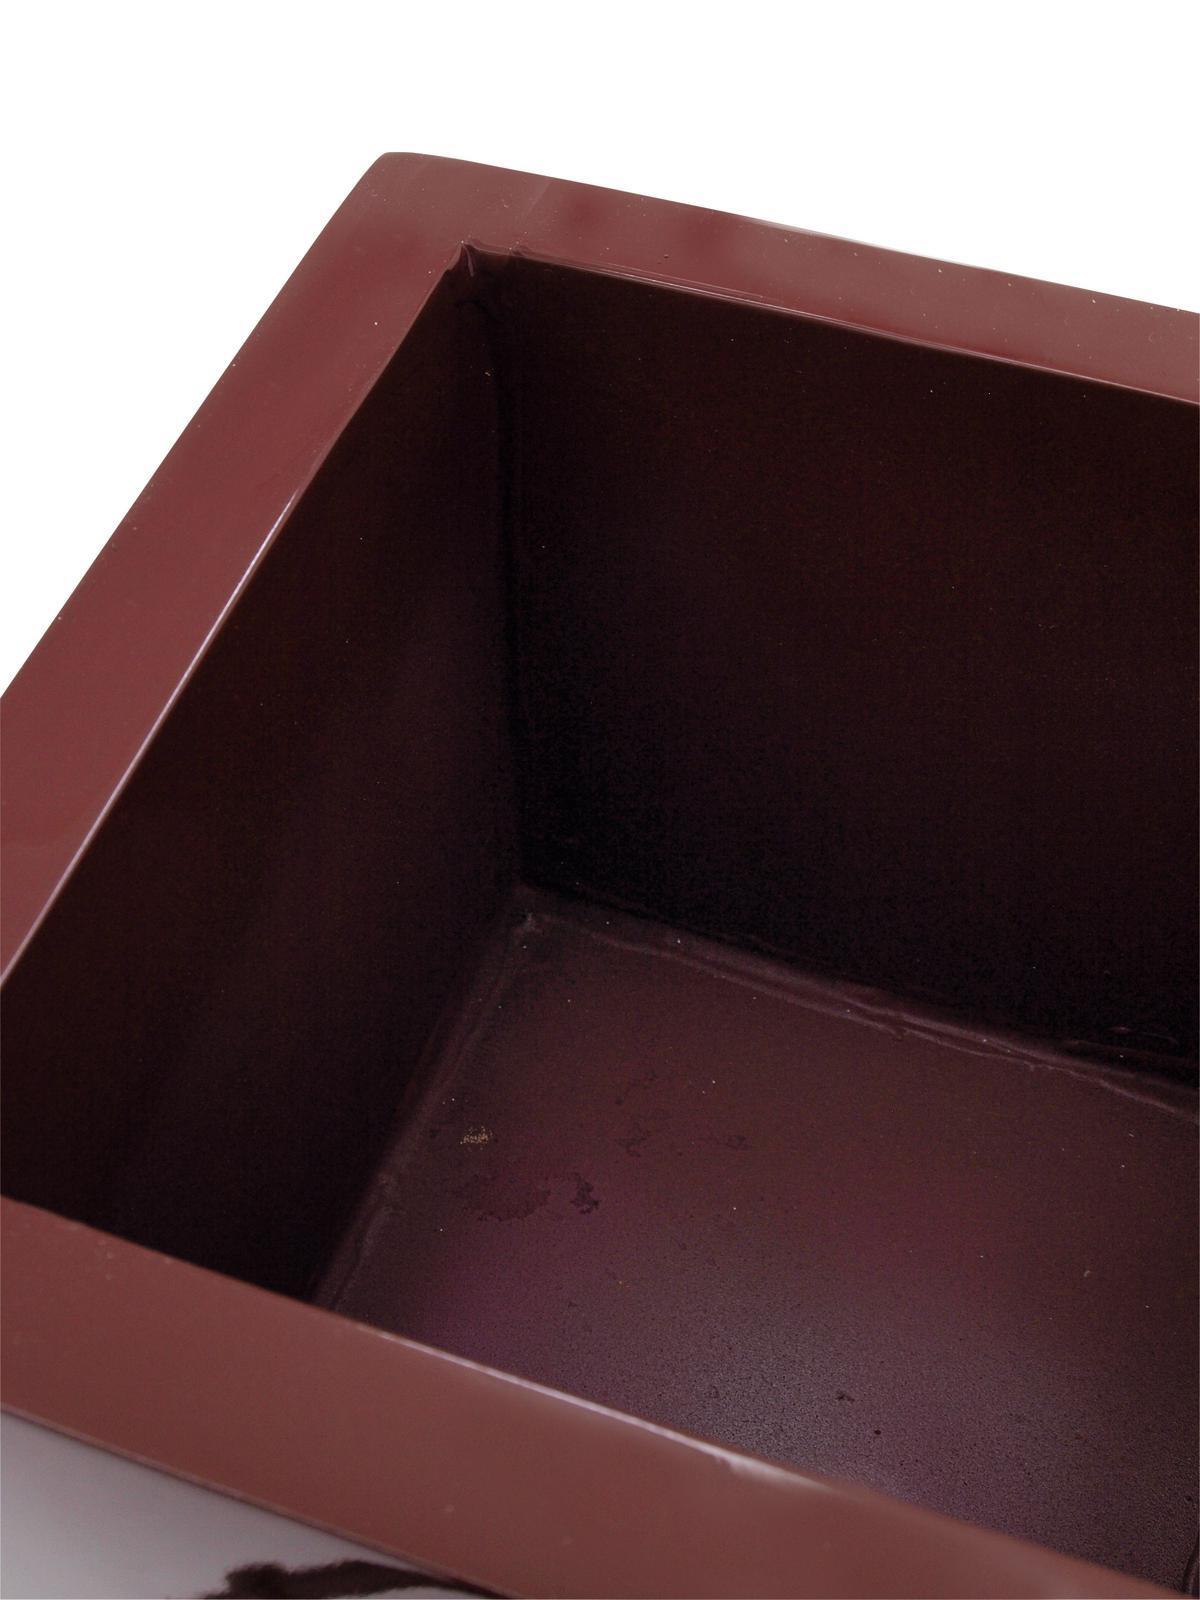 EUROPALMS LEICHTSIN BOX-120, lucido-rosso